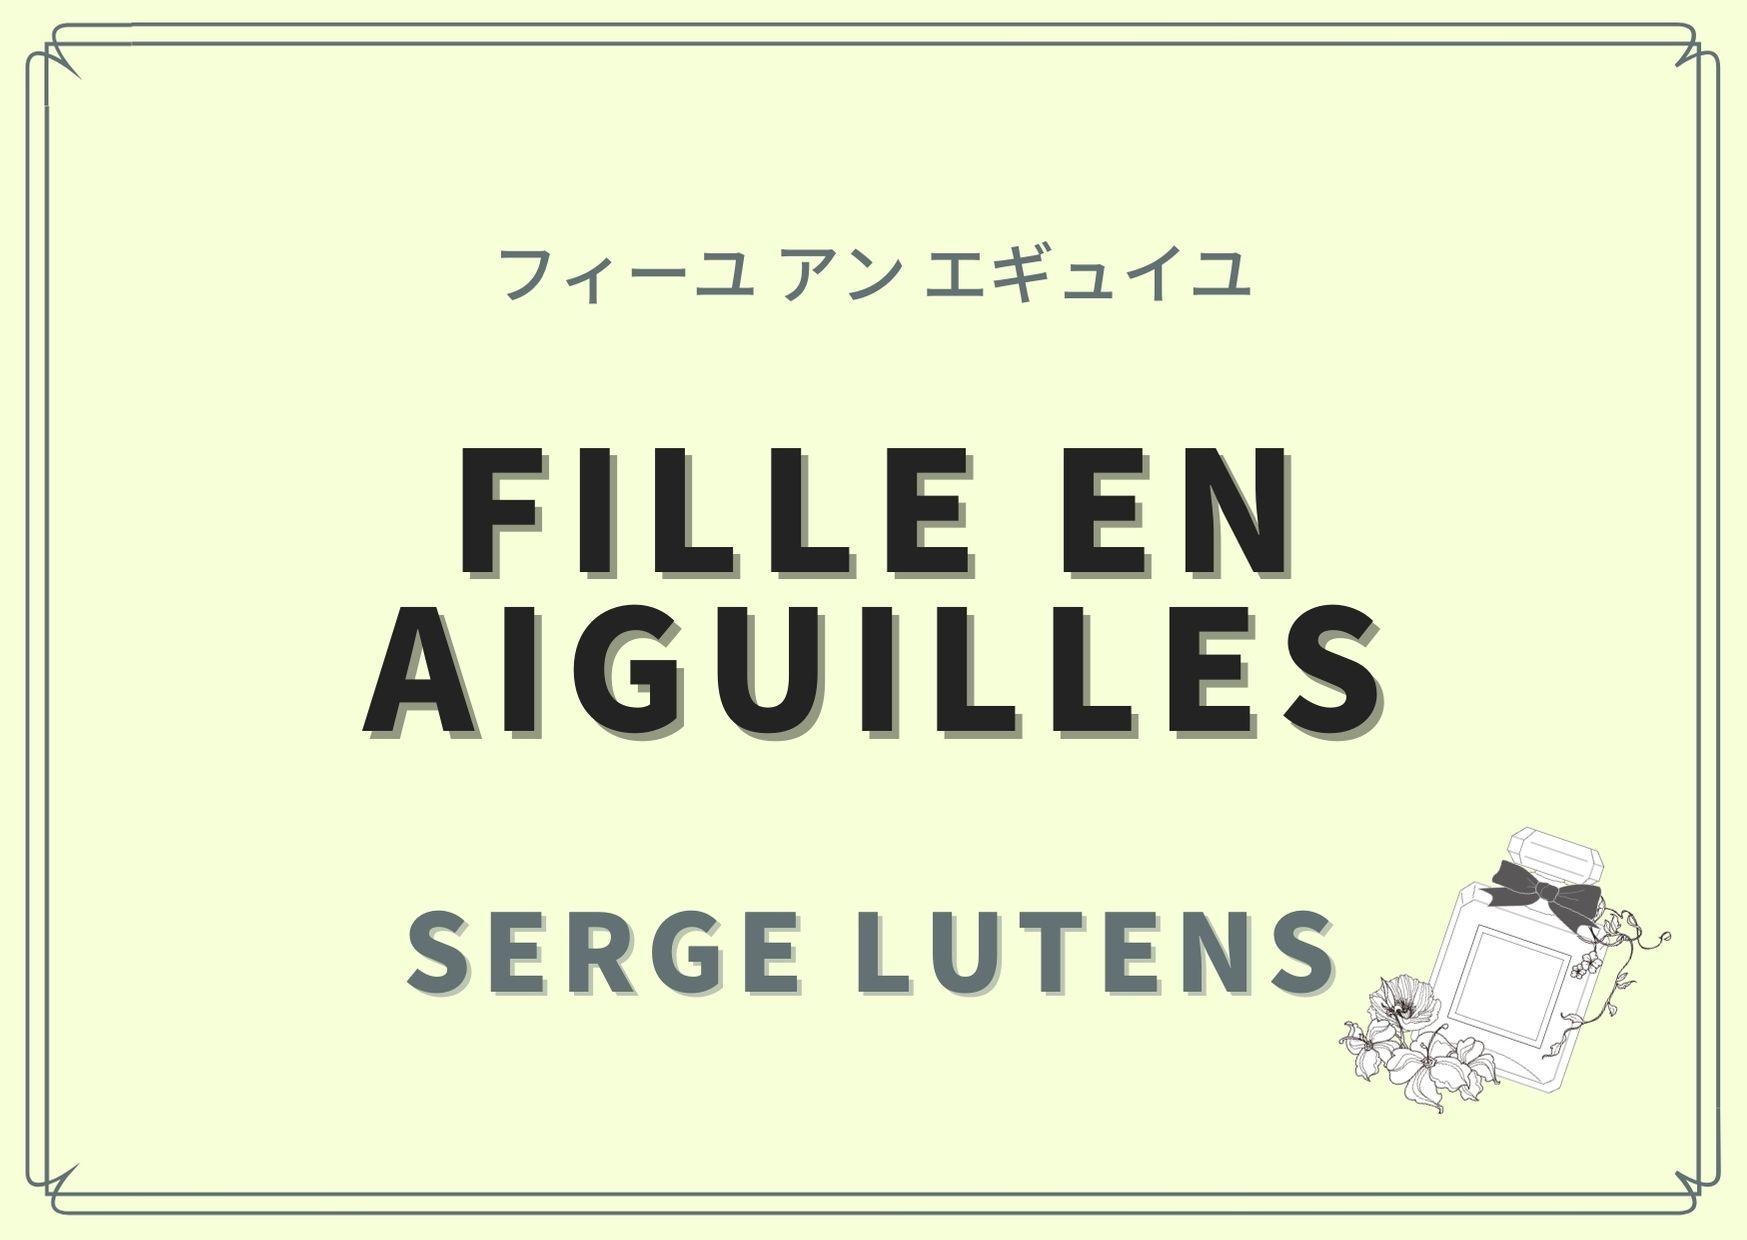 Fille en aiguilles(フィーユ アン エギュイユ)/SERGE LUTENS(セルジュ ルタンス)